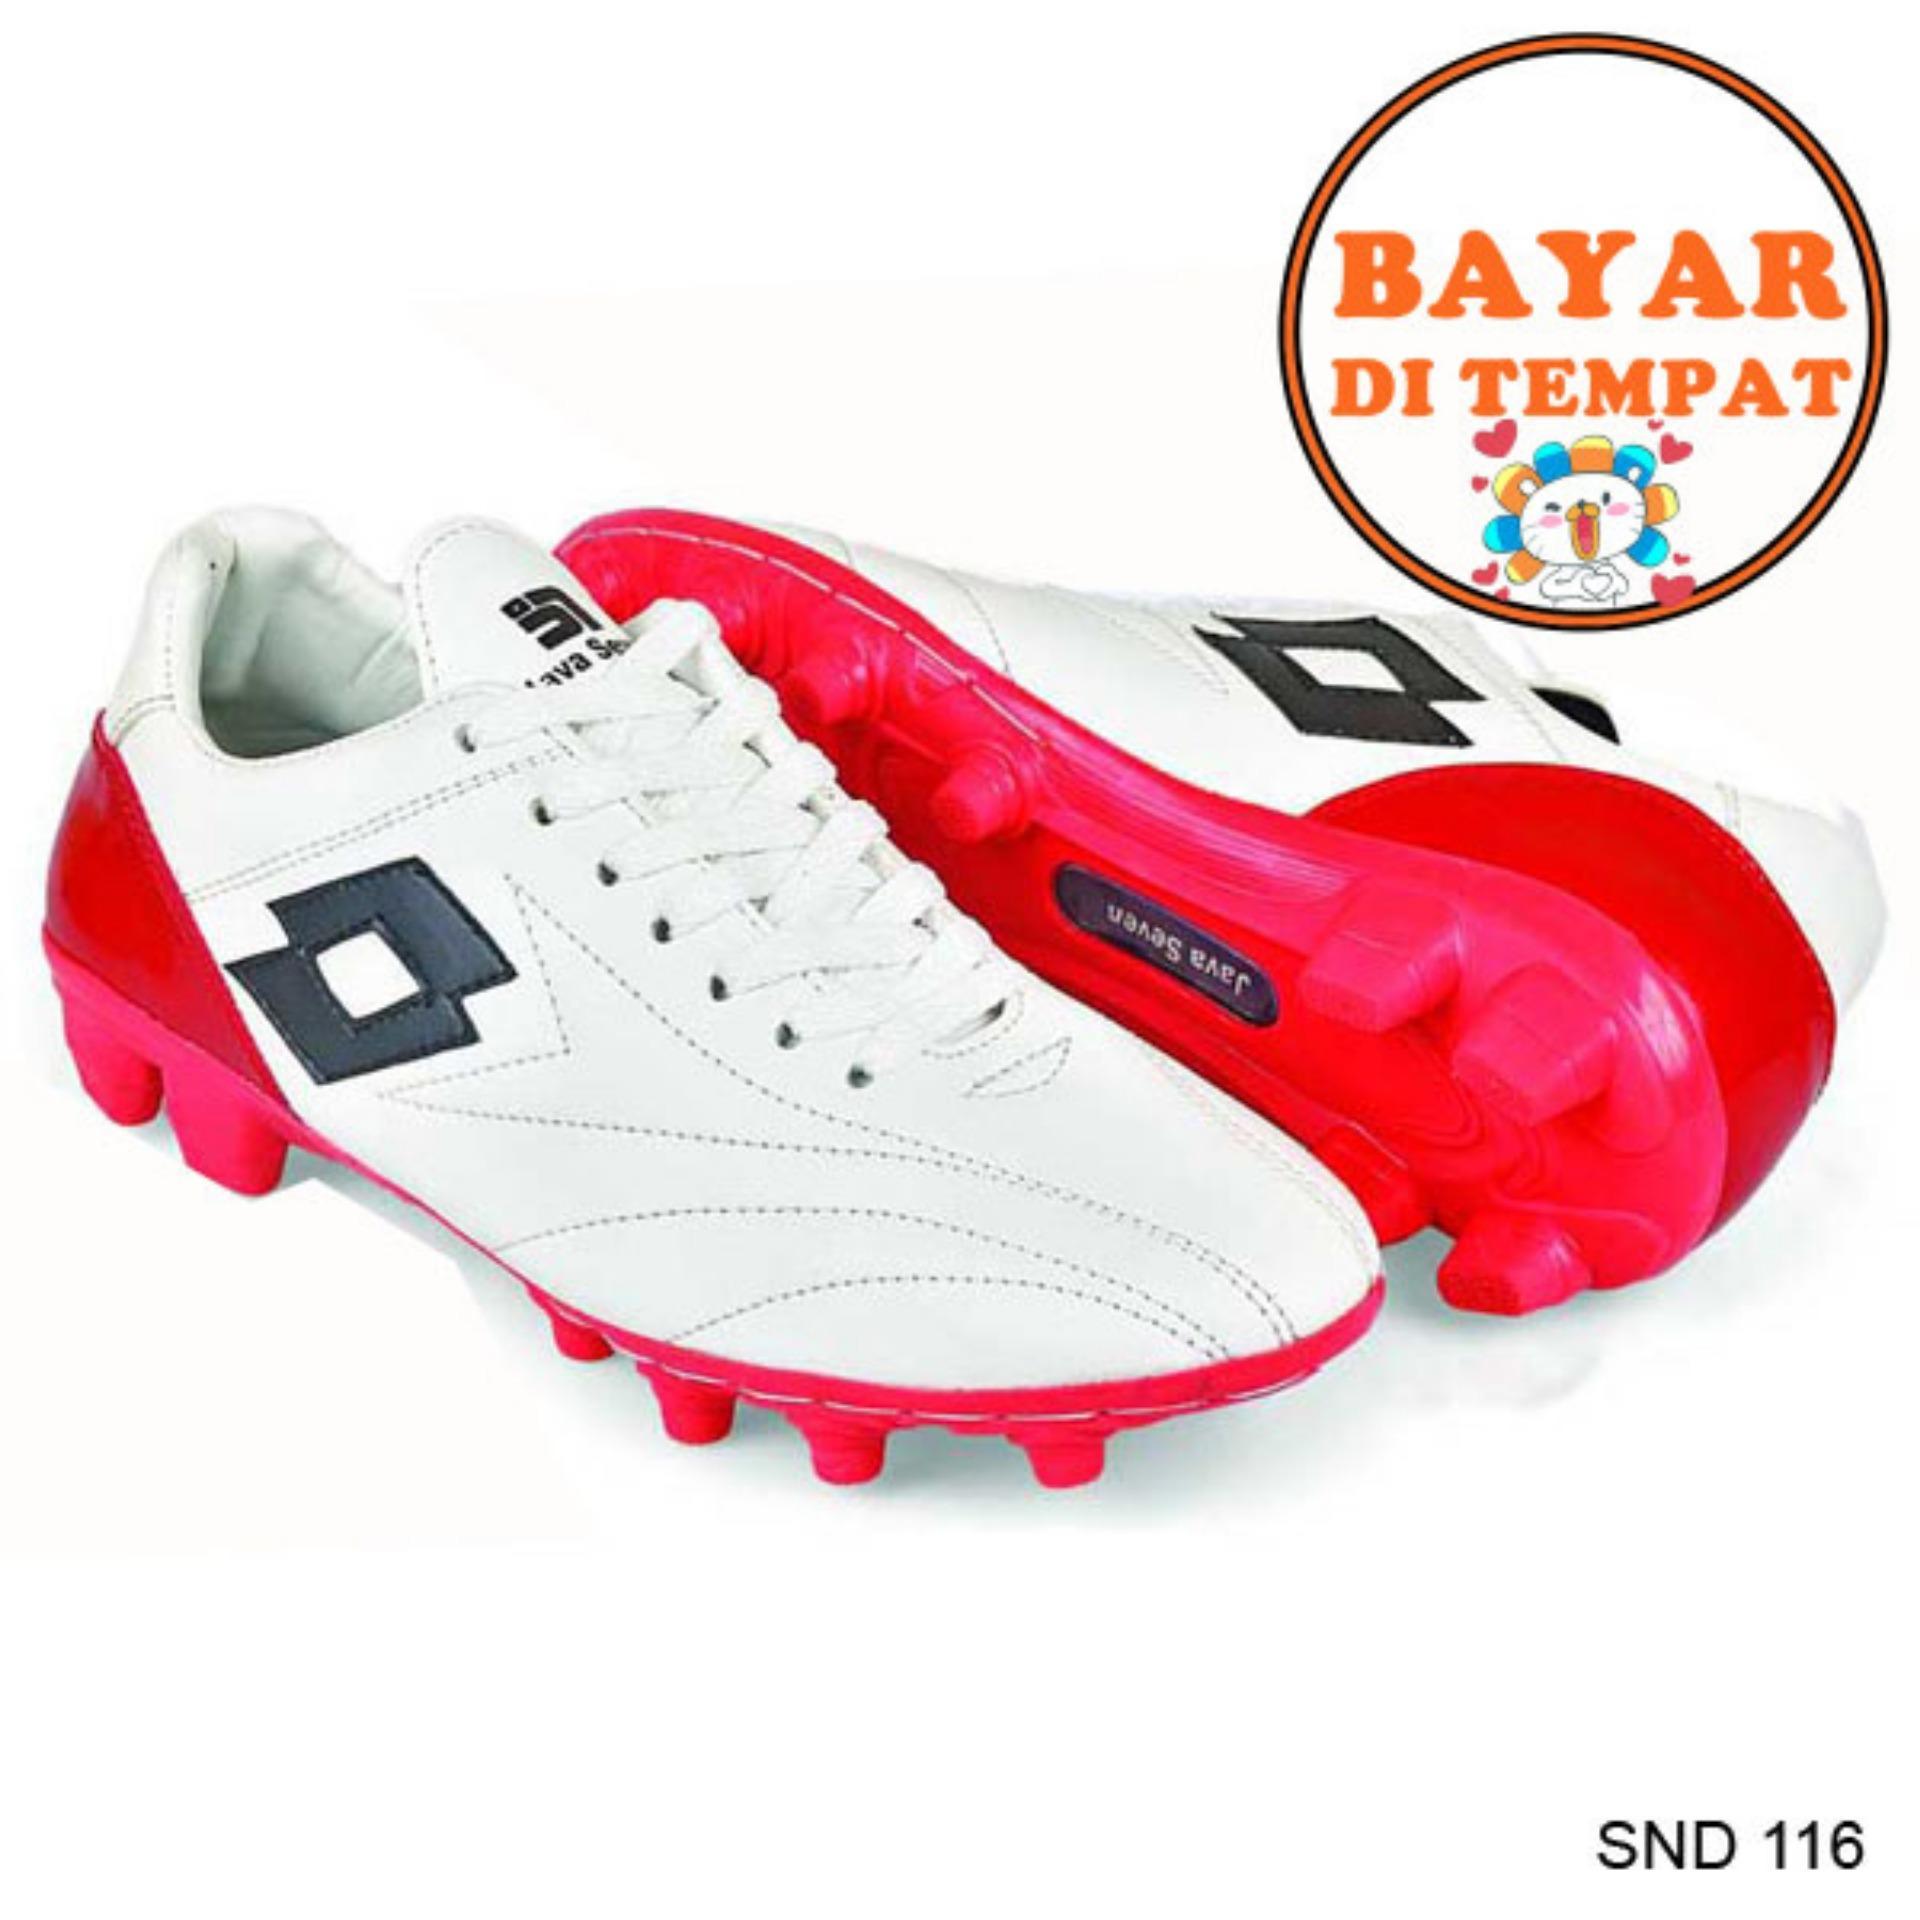 Java Sepatu Sepak Bola Keren Dengan Japutan Sole Yang Kuat SND 116 - Putih 3f1755ef6c